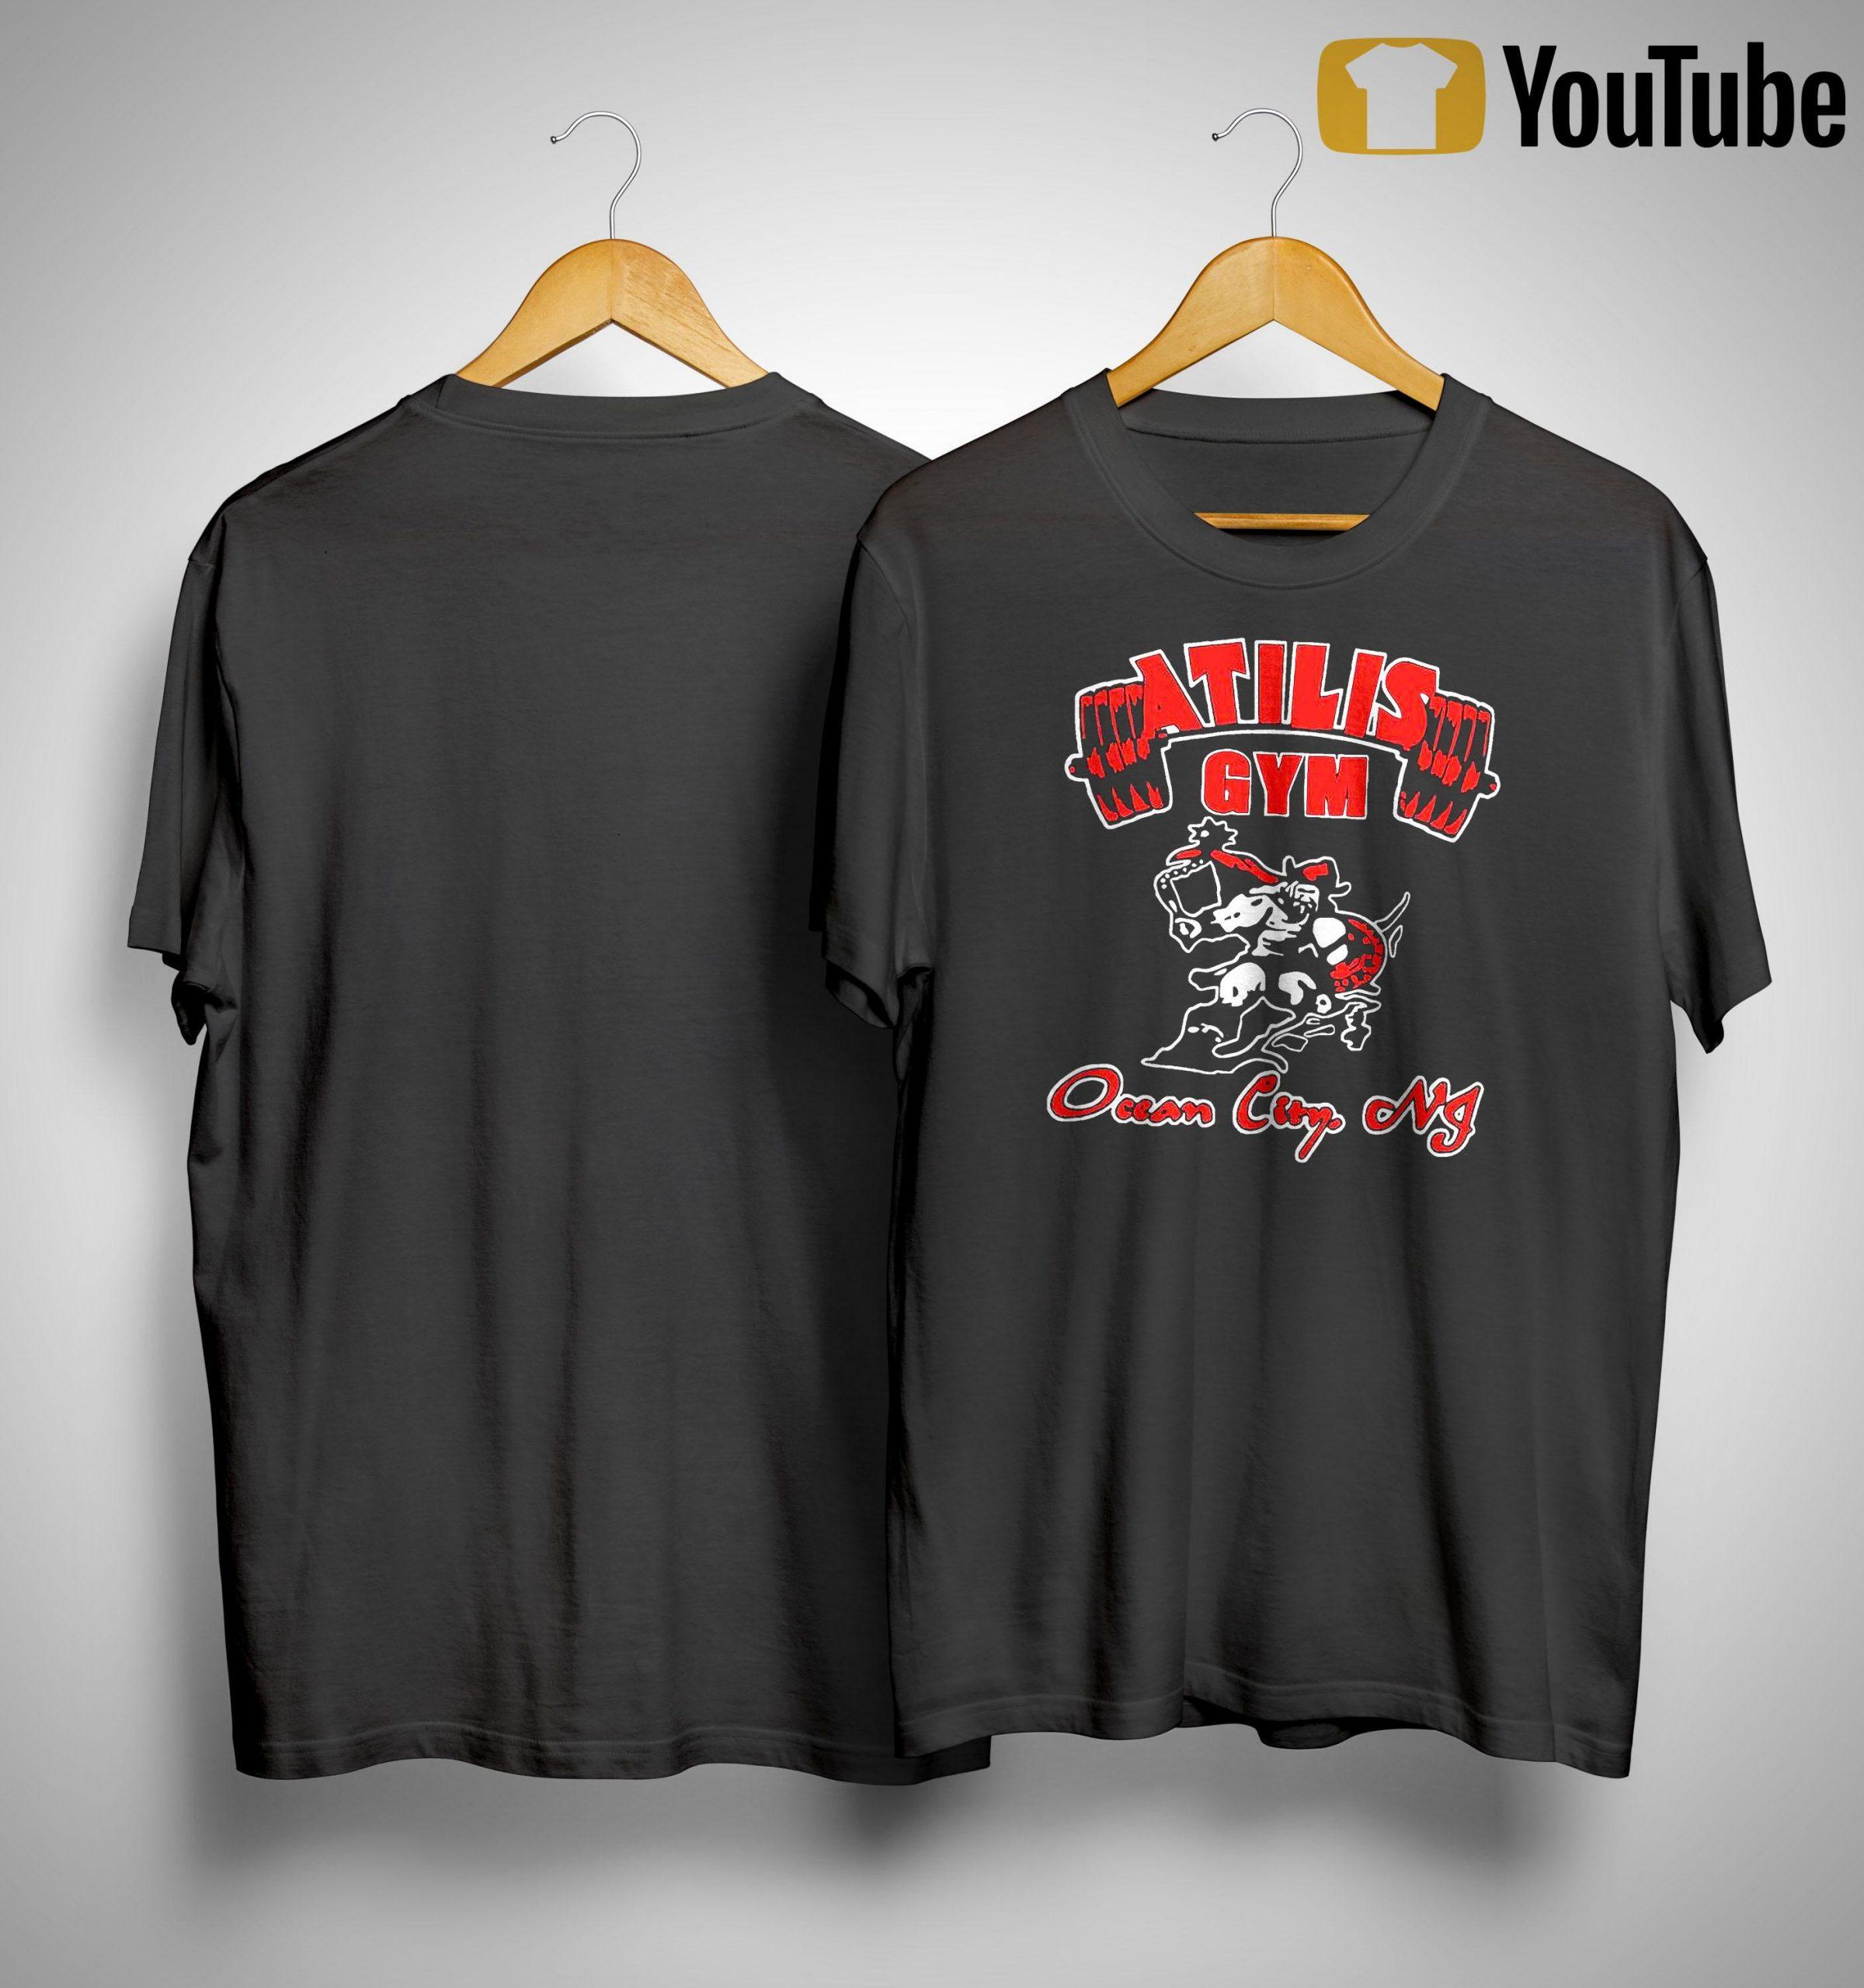 Atilis Gym Ocean City Shirt